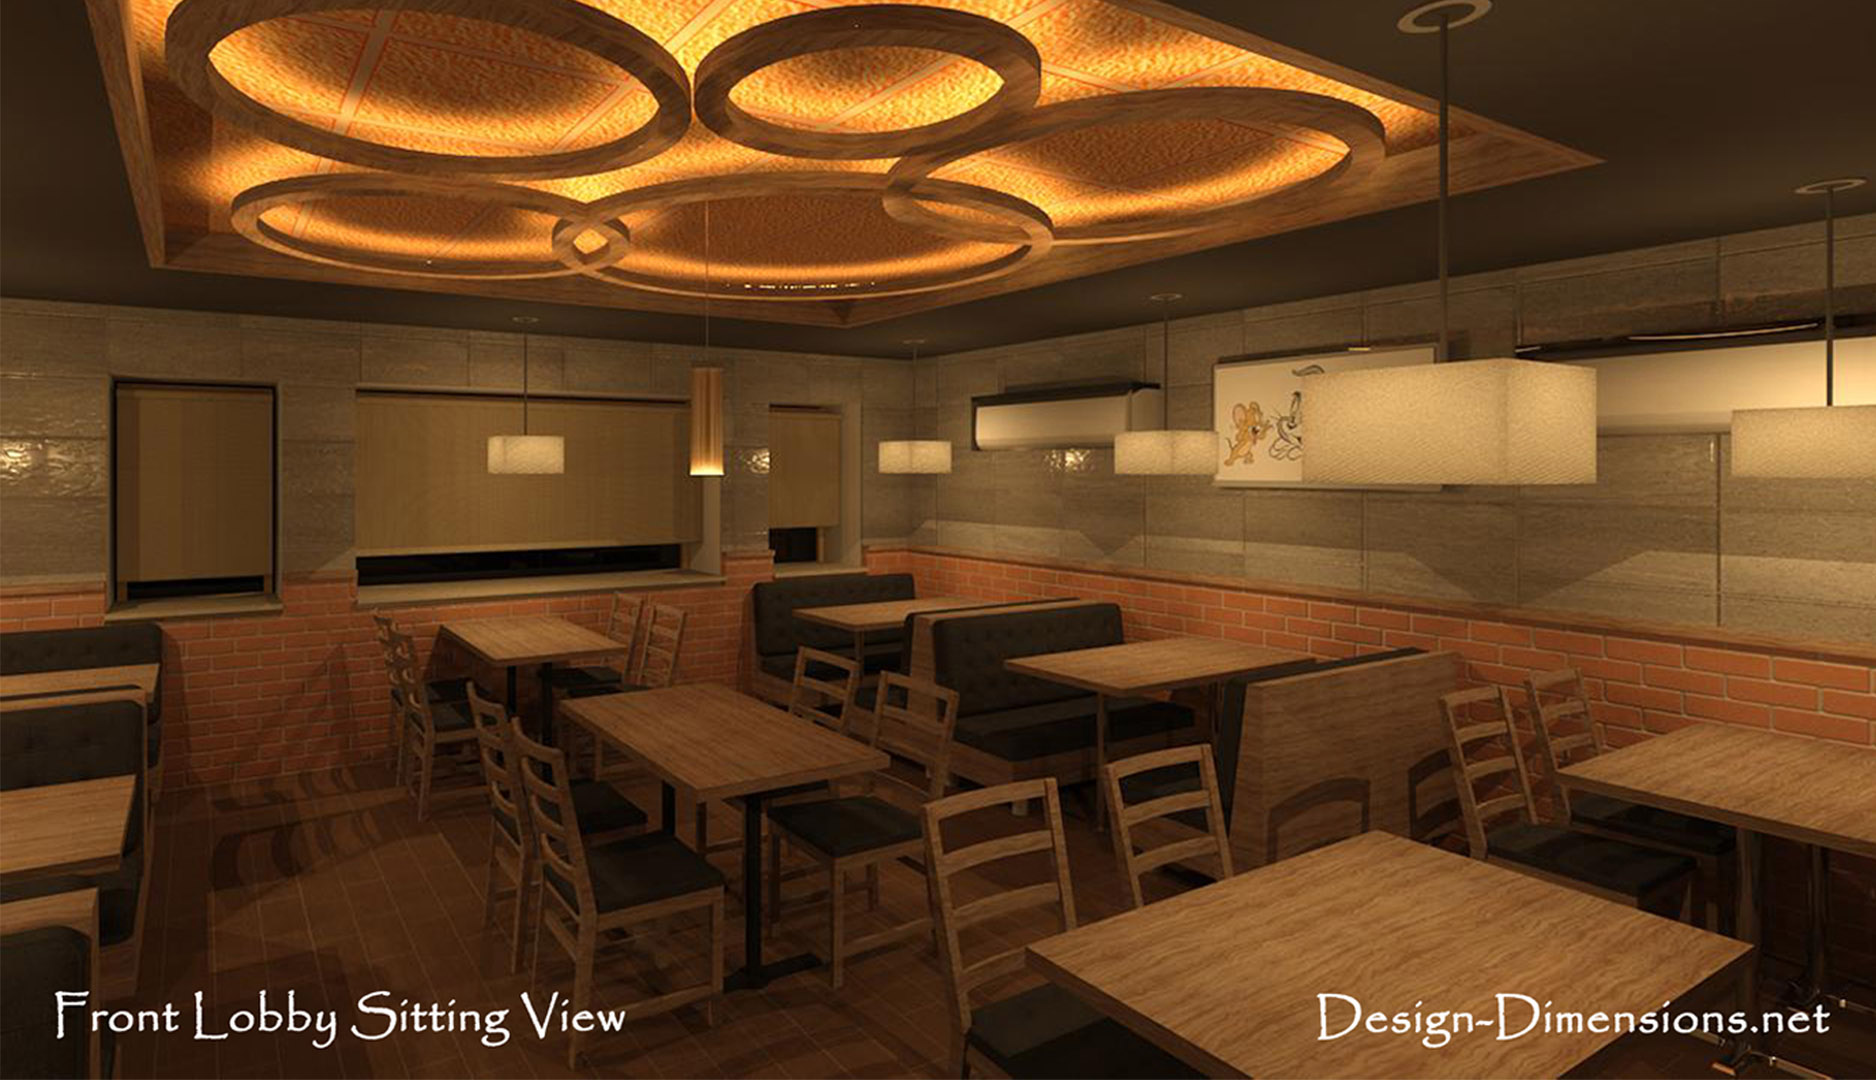 https://design-dimensions.net/public/uploads/1604825774_Dominos-Pizza-11.jpg